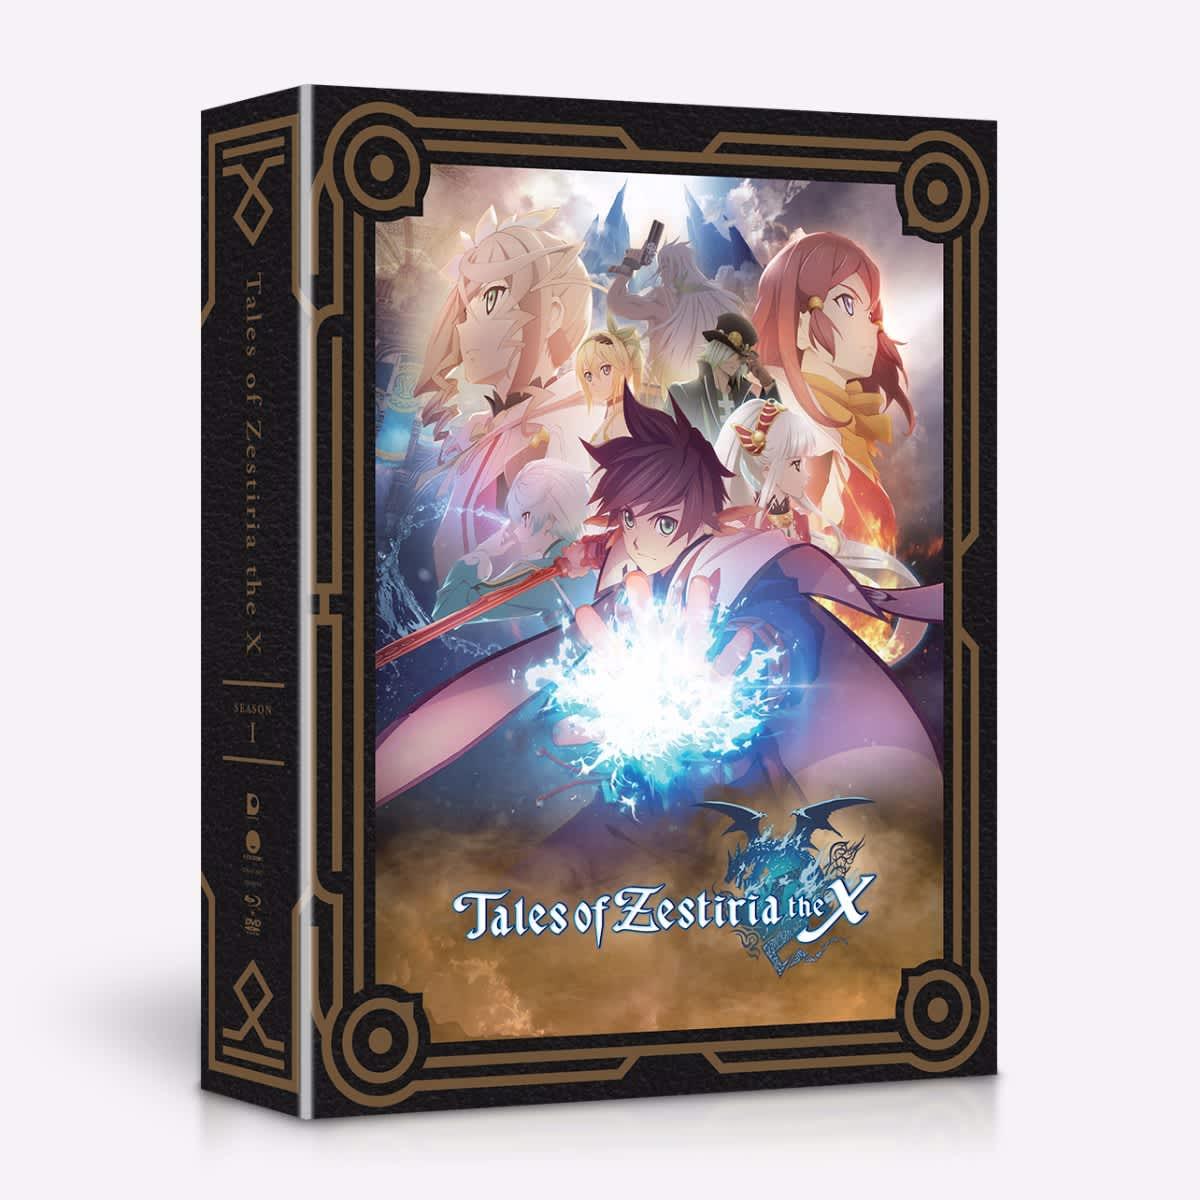 Tales of Zestiria the X Season 1 Limited Edition Blu-ray/DVD